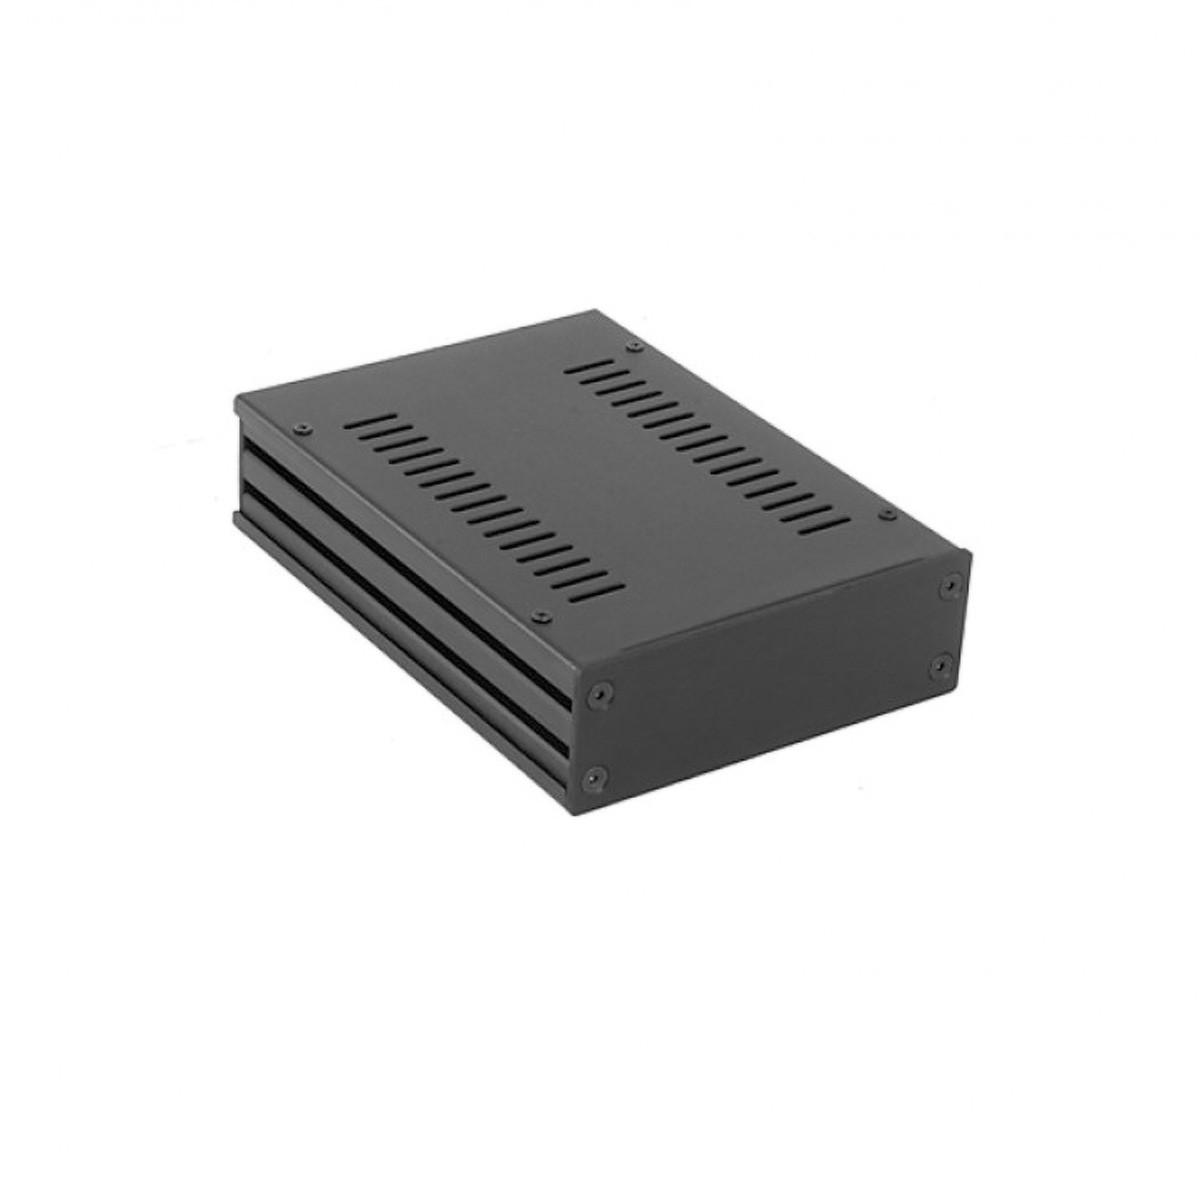 HIFI 2000 GALAXY GX147 Aluminium Case 124x170x40mm 3mm Front Panel Black